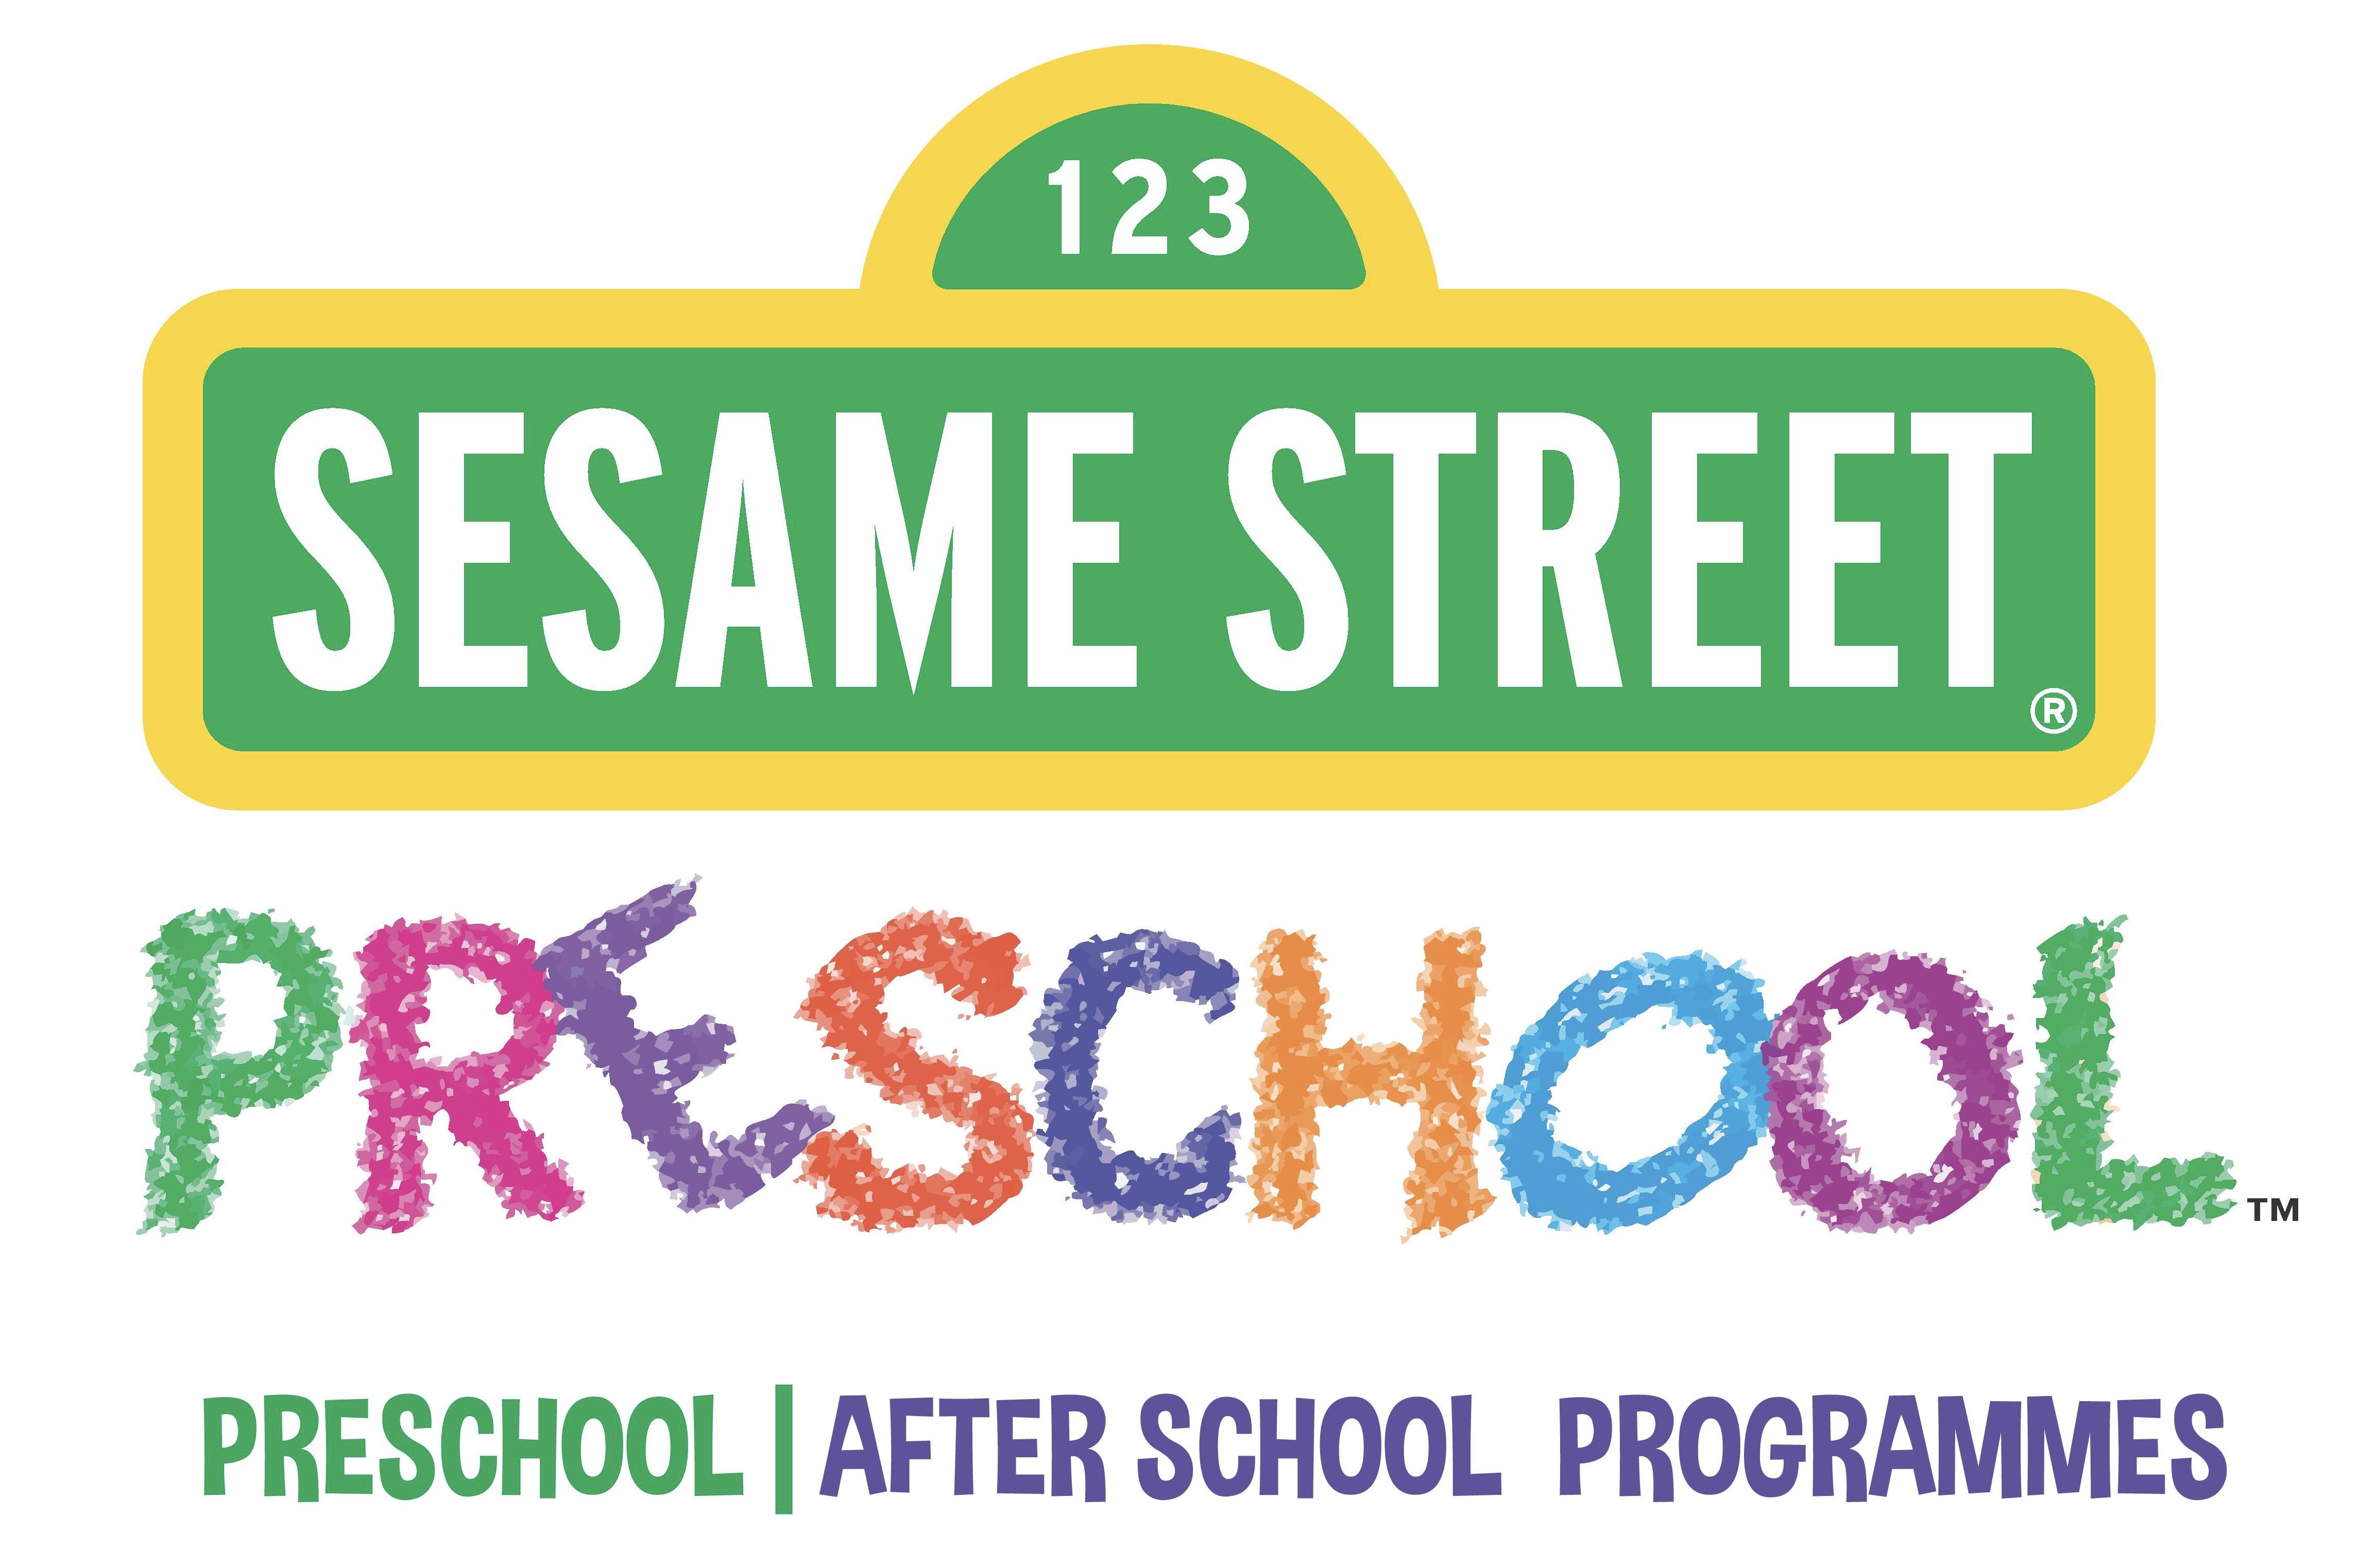 Sesame Street Preschool, HSR Layout - logo